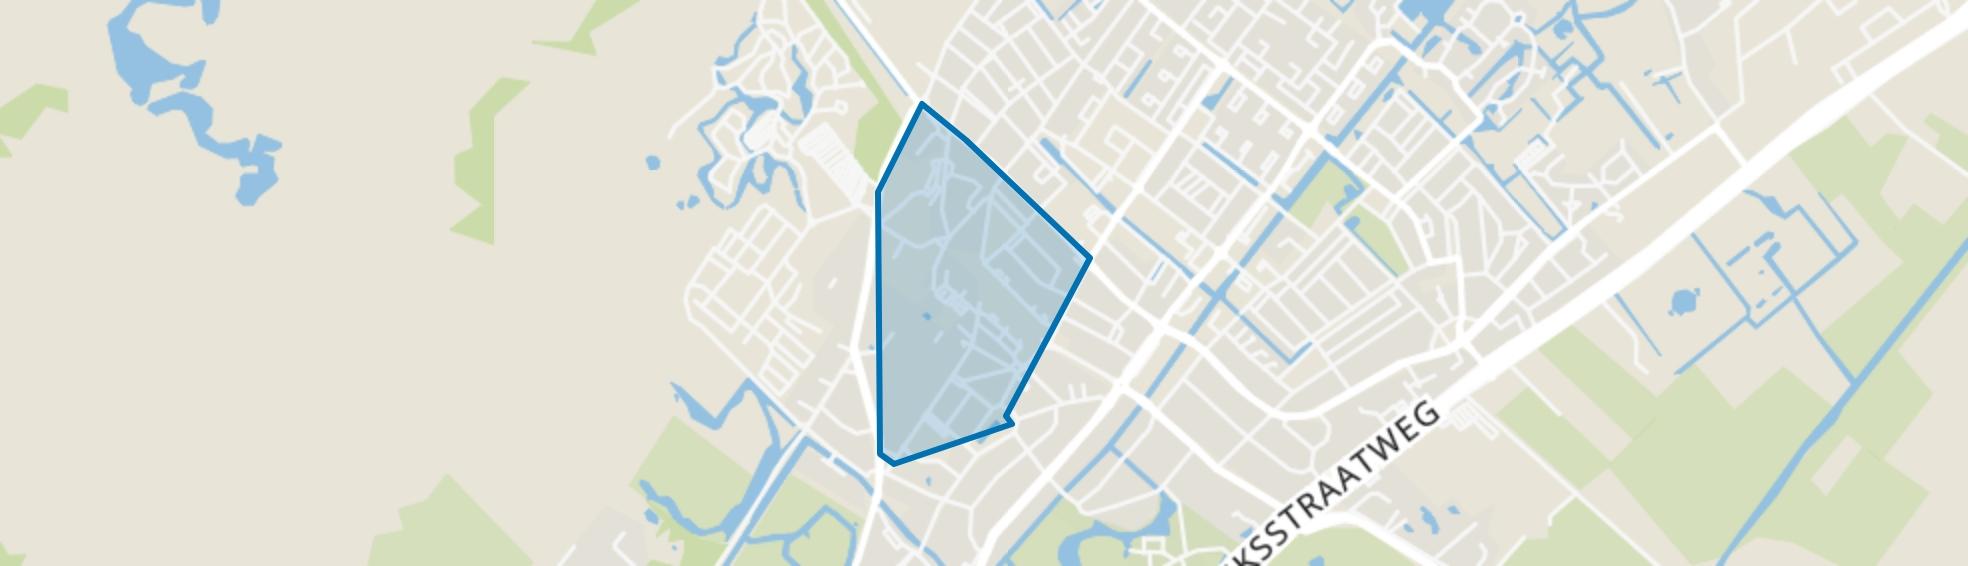 Dorp Wassenaar, Wassenaar map